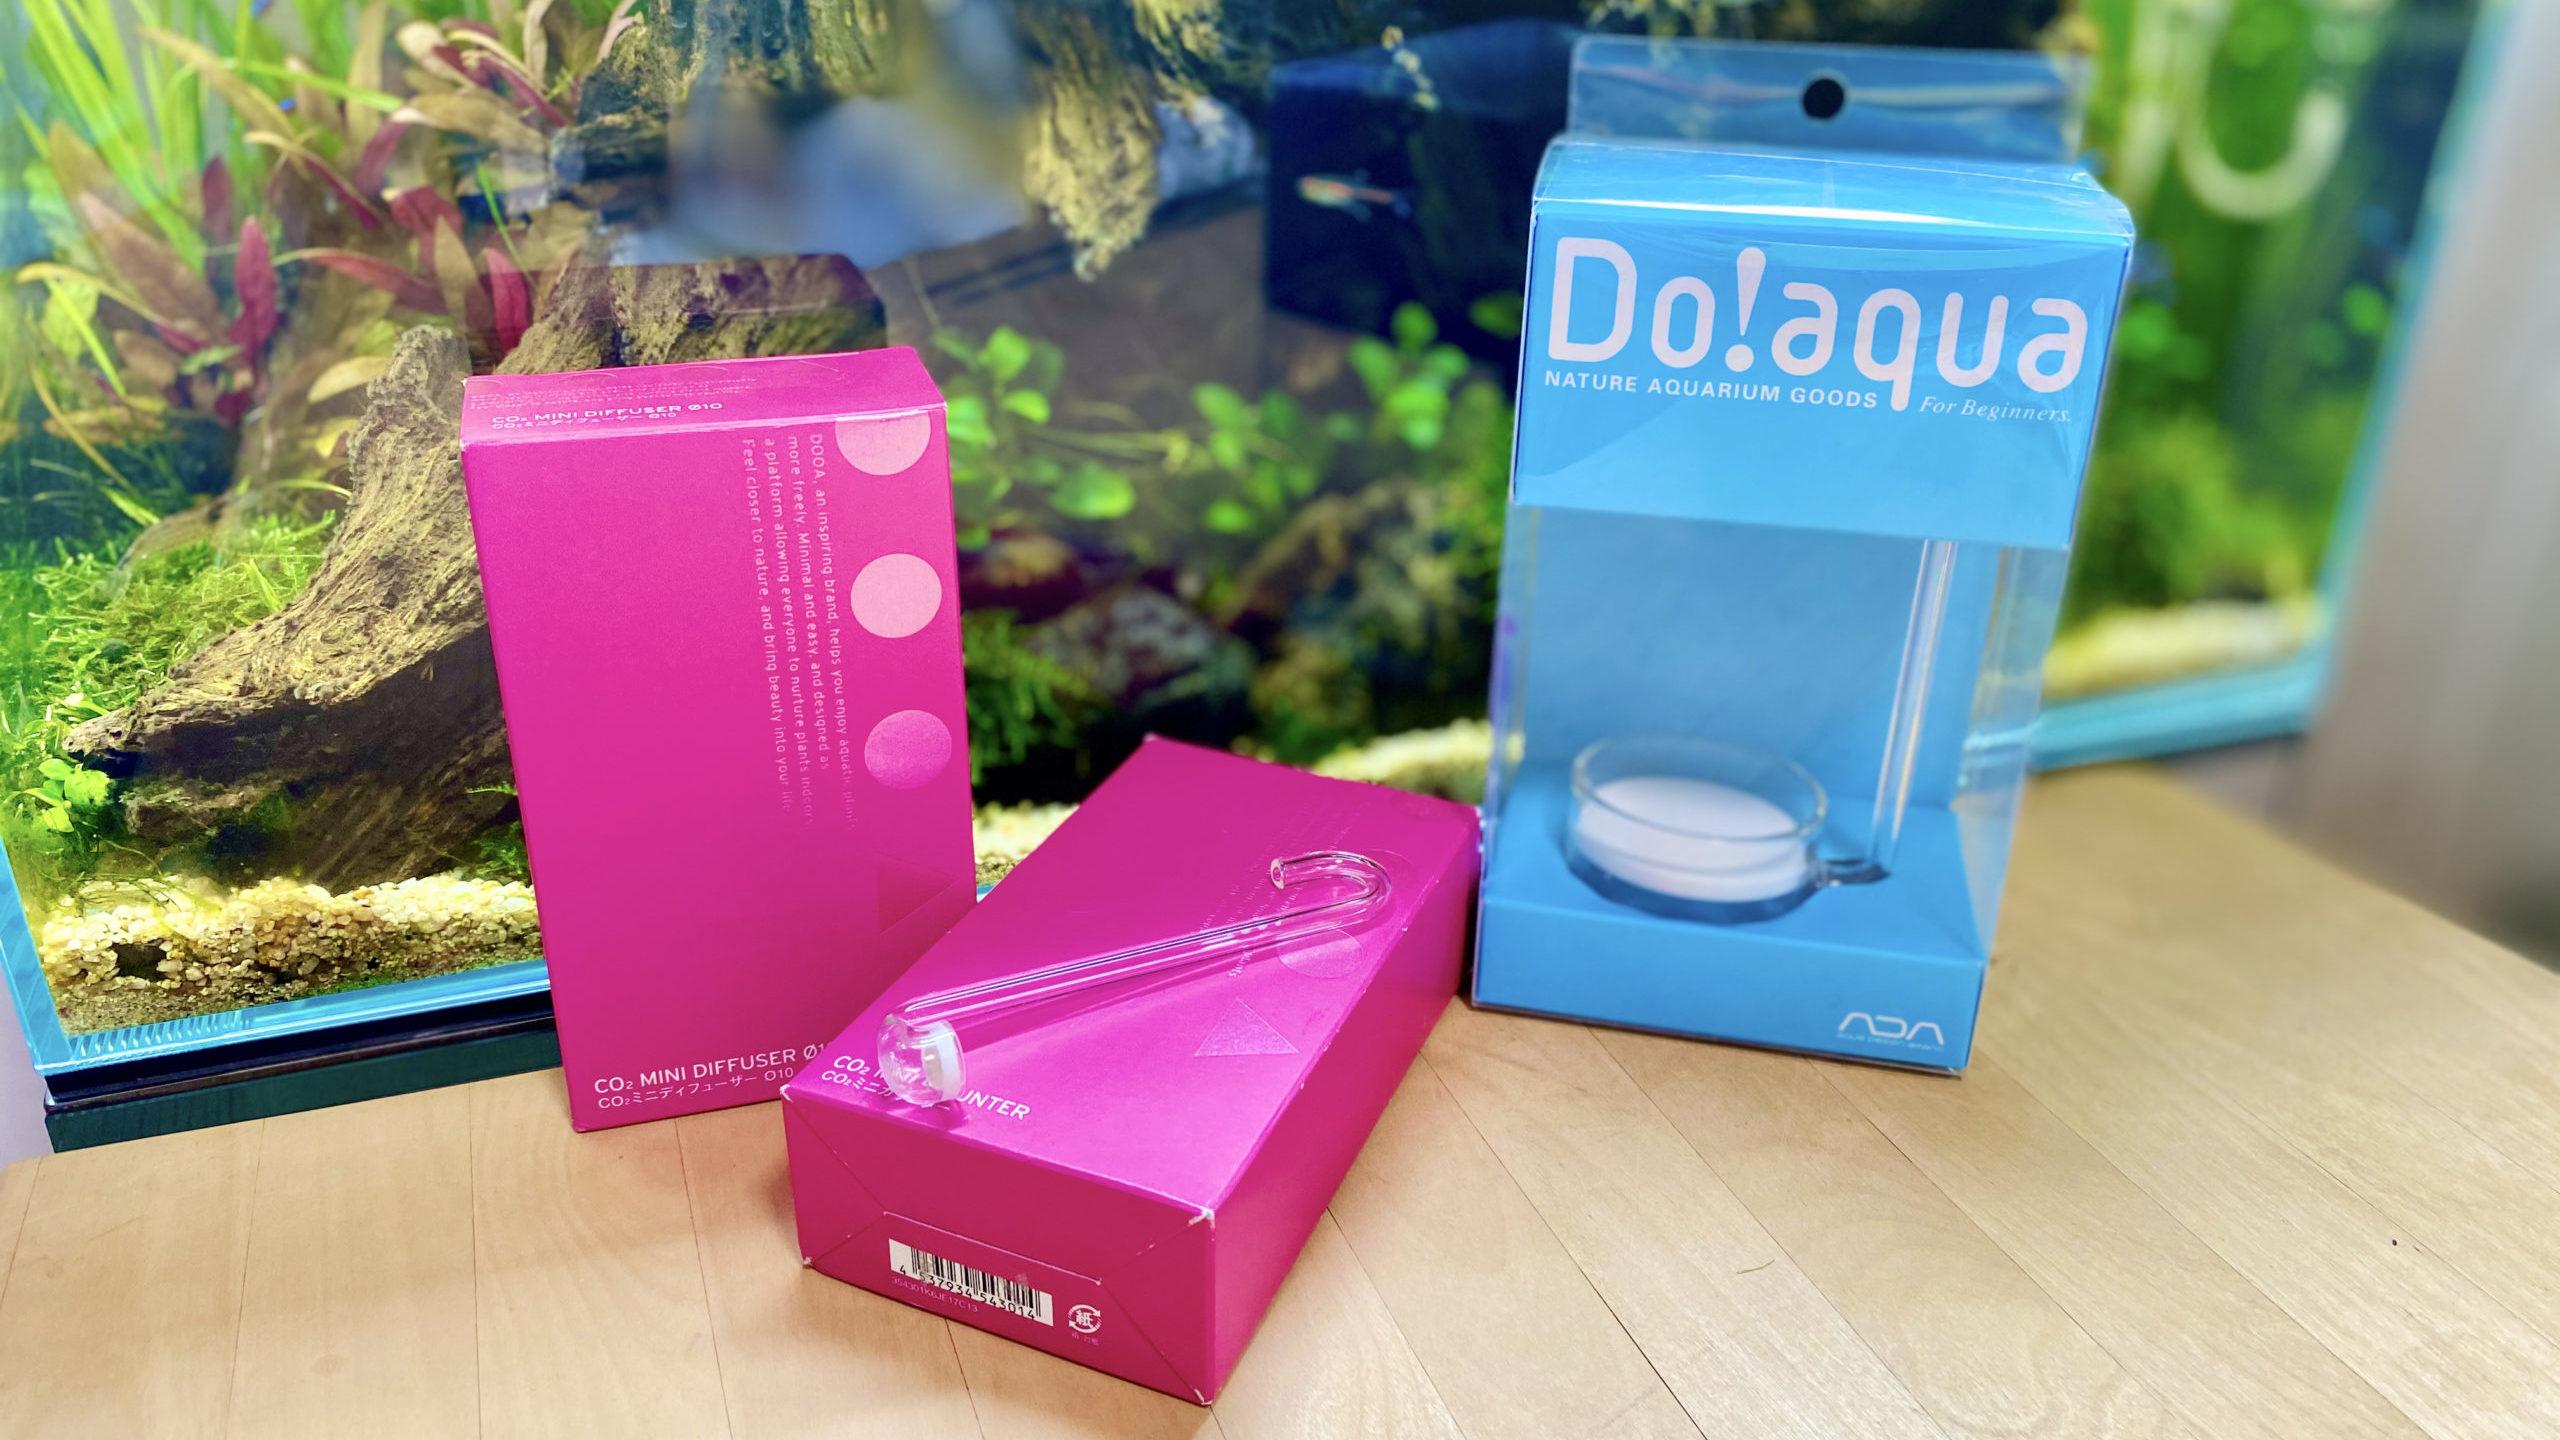 DOOA vs Do! aqua: What's the Difference?